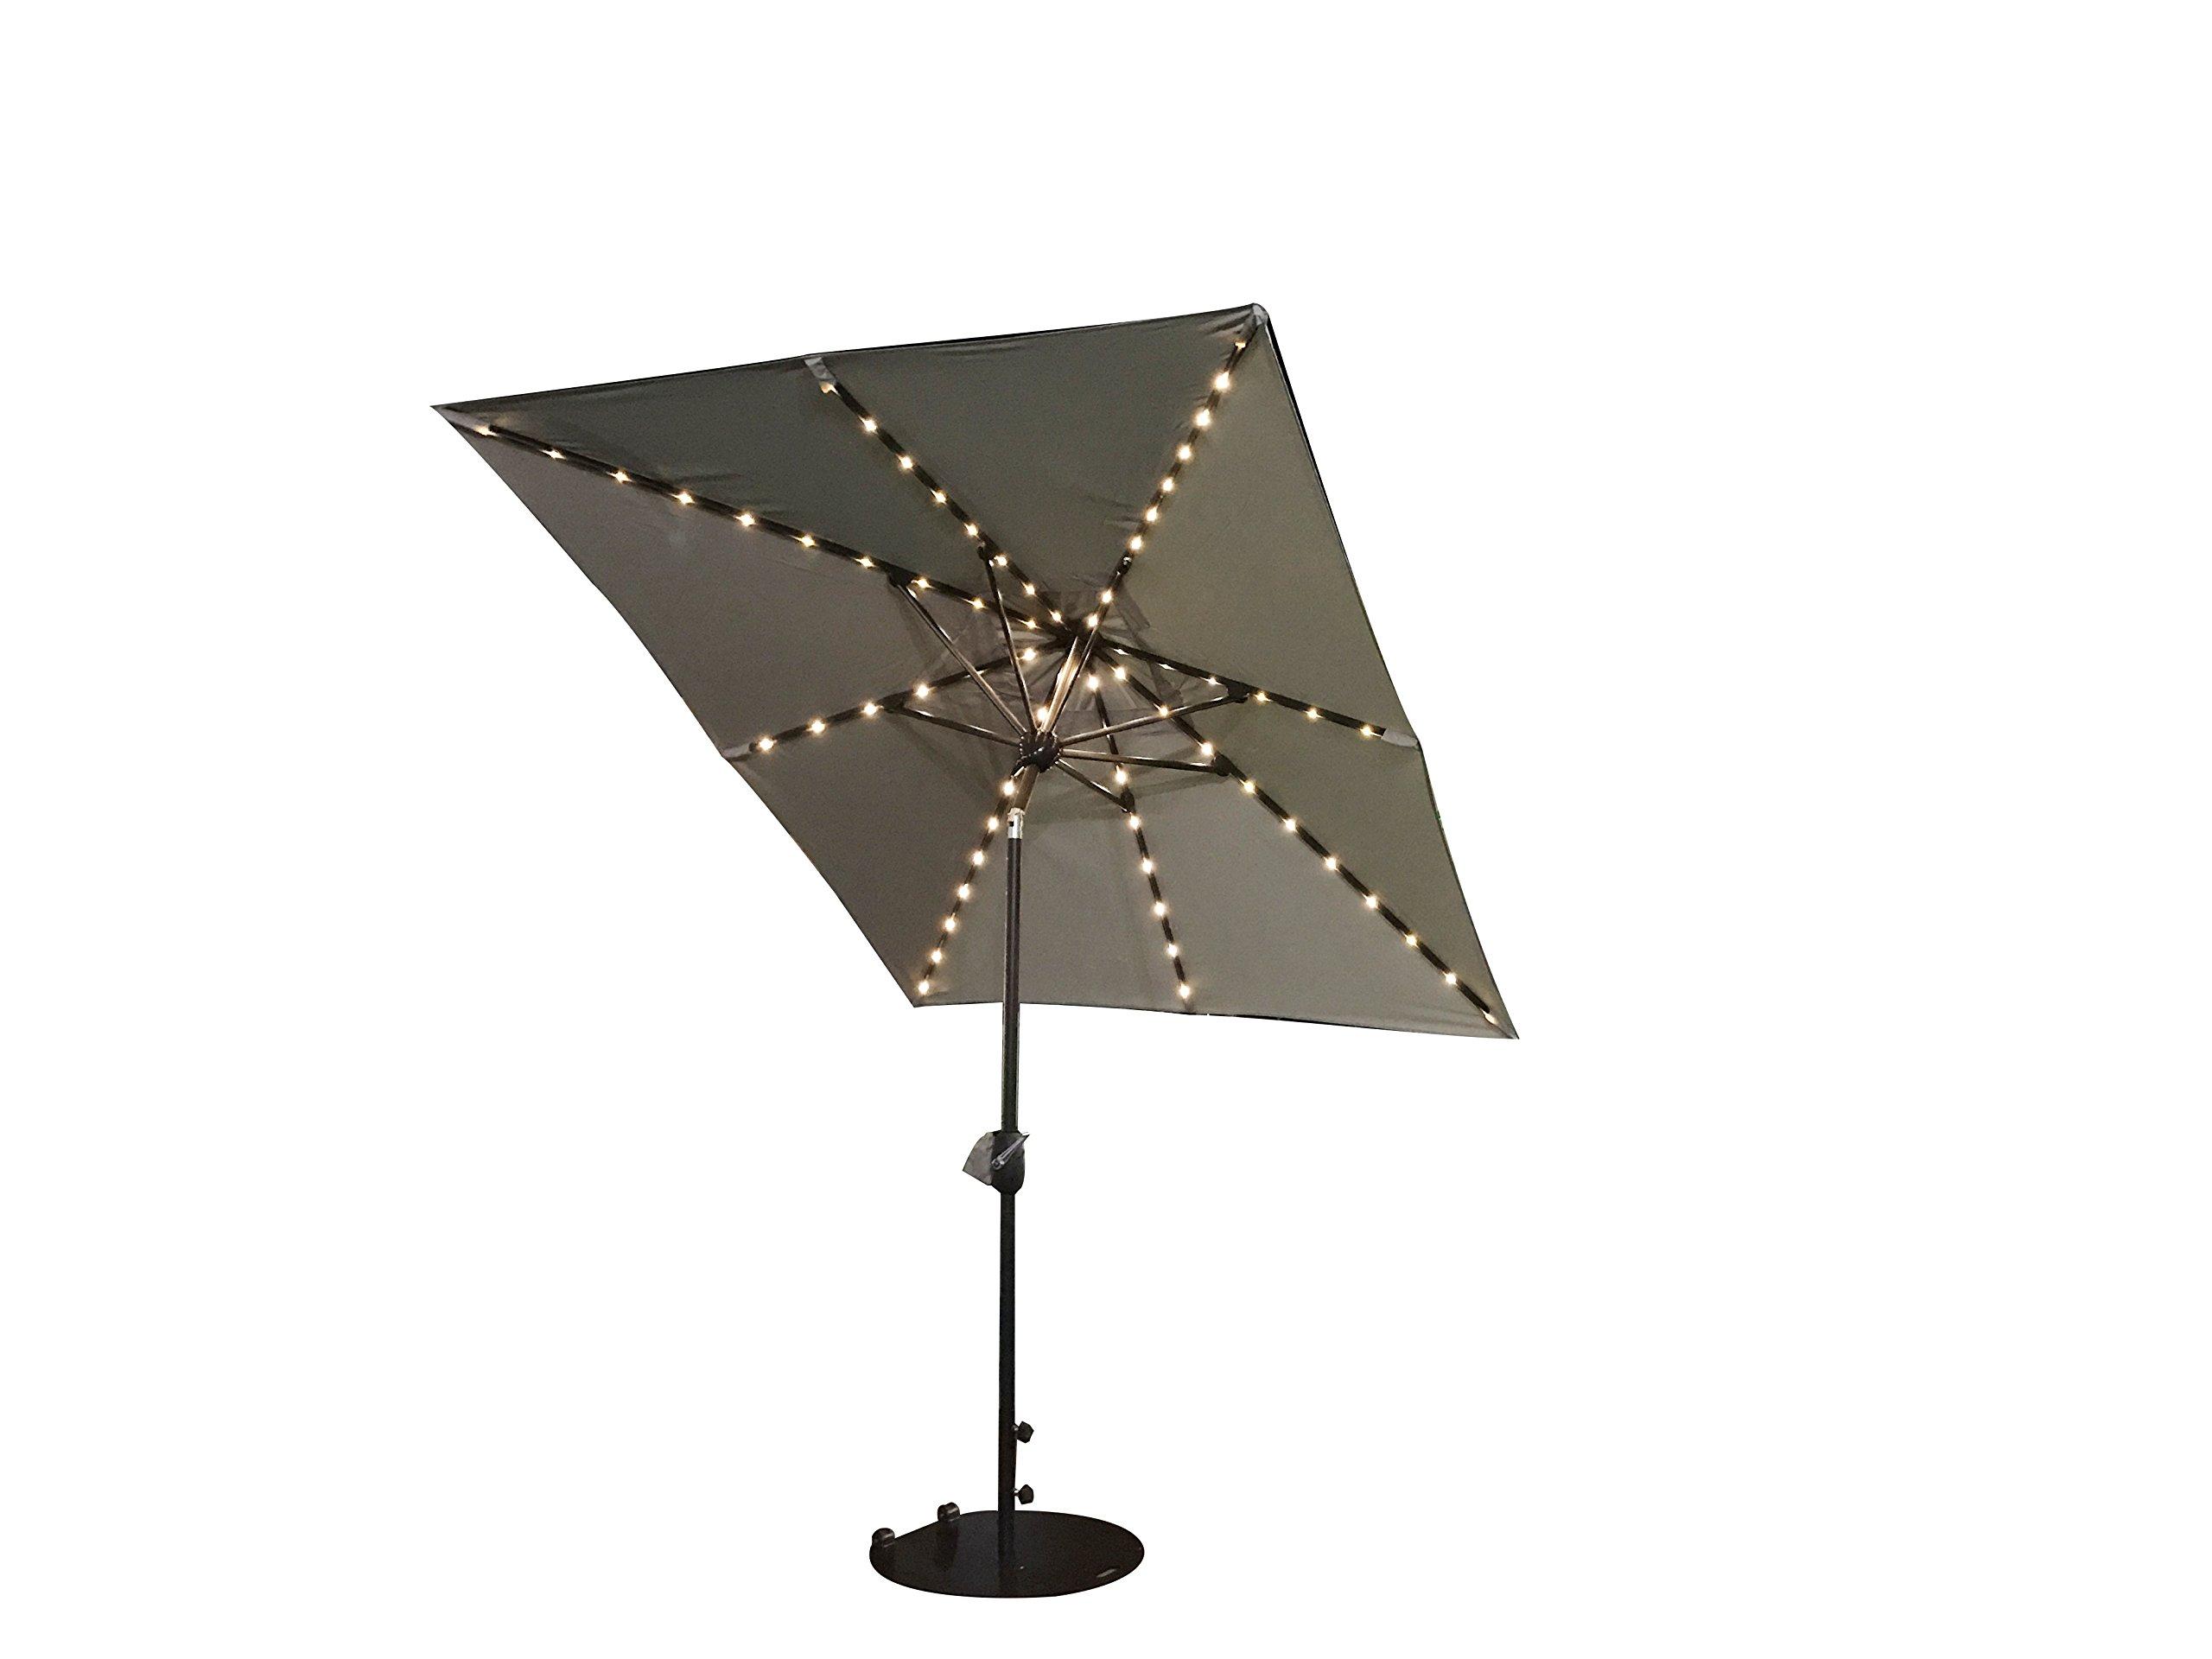 SORARA Patio Umbrella with Solar Powered Rectangular Table Umbrella with Solar Powered 68 LED Lights with Tilt&Crank&Umbrella Cover, 7 by 9 Feet, Beige